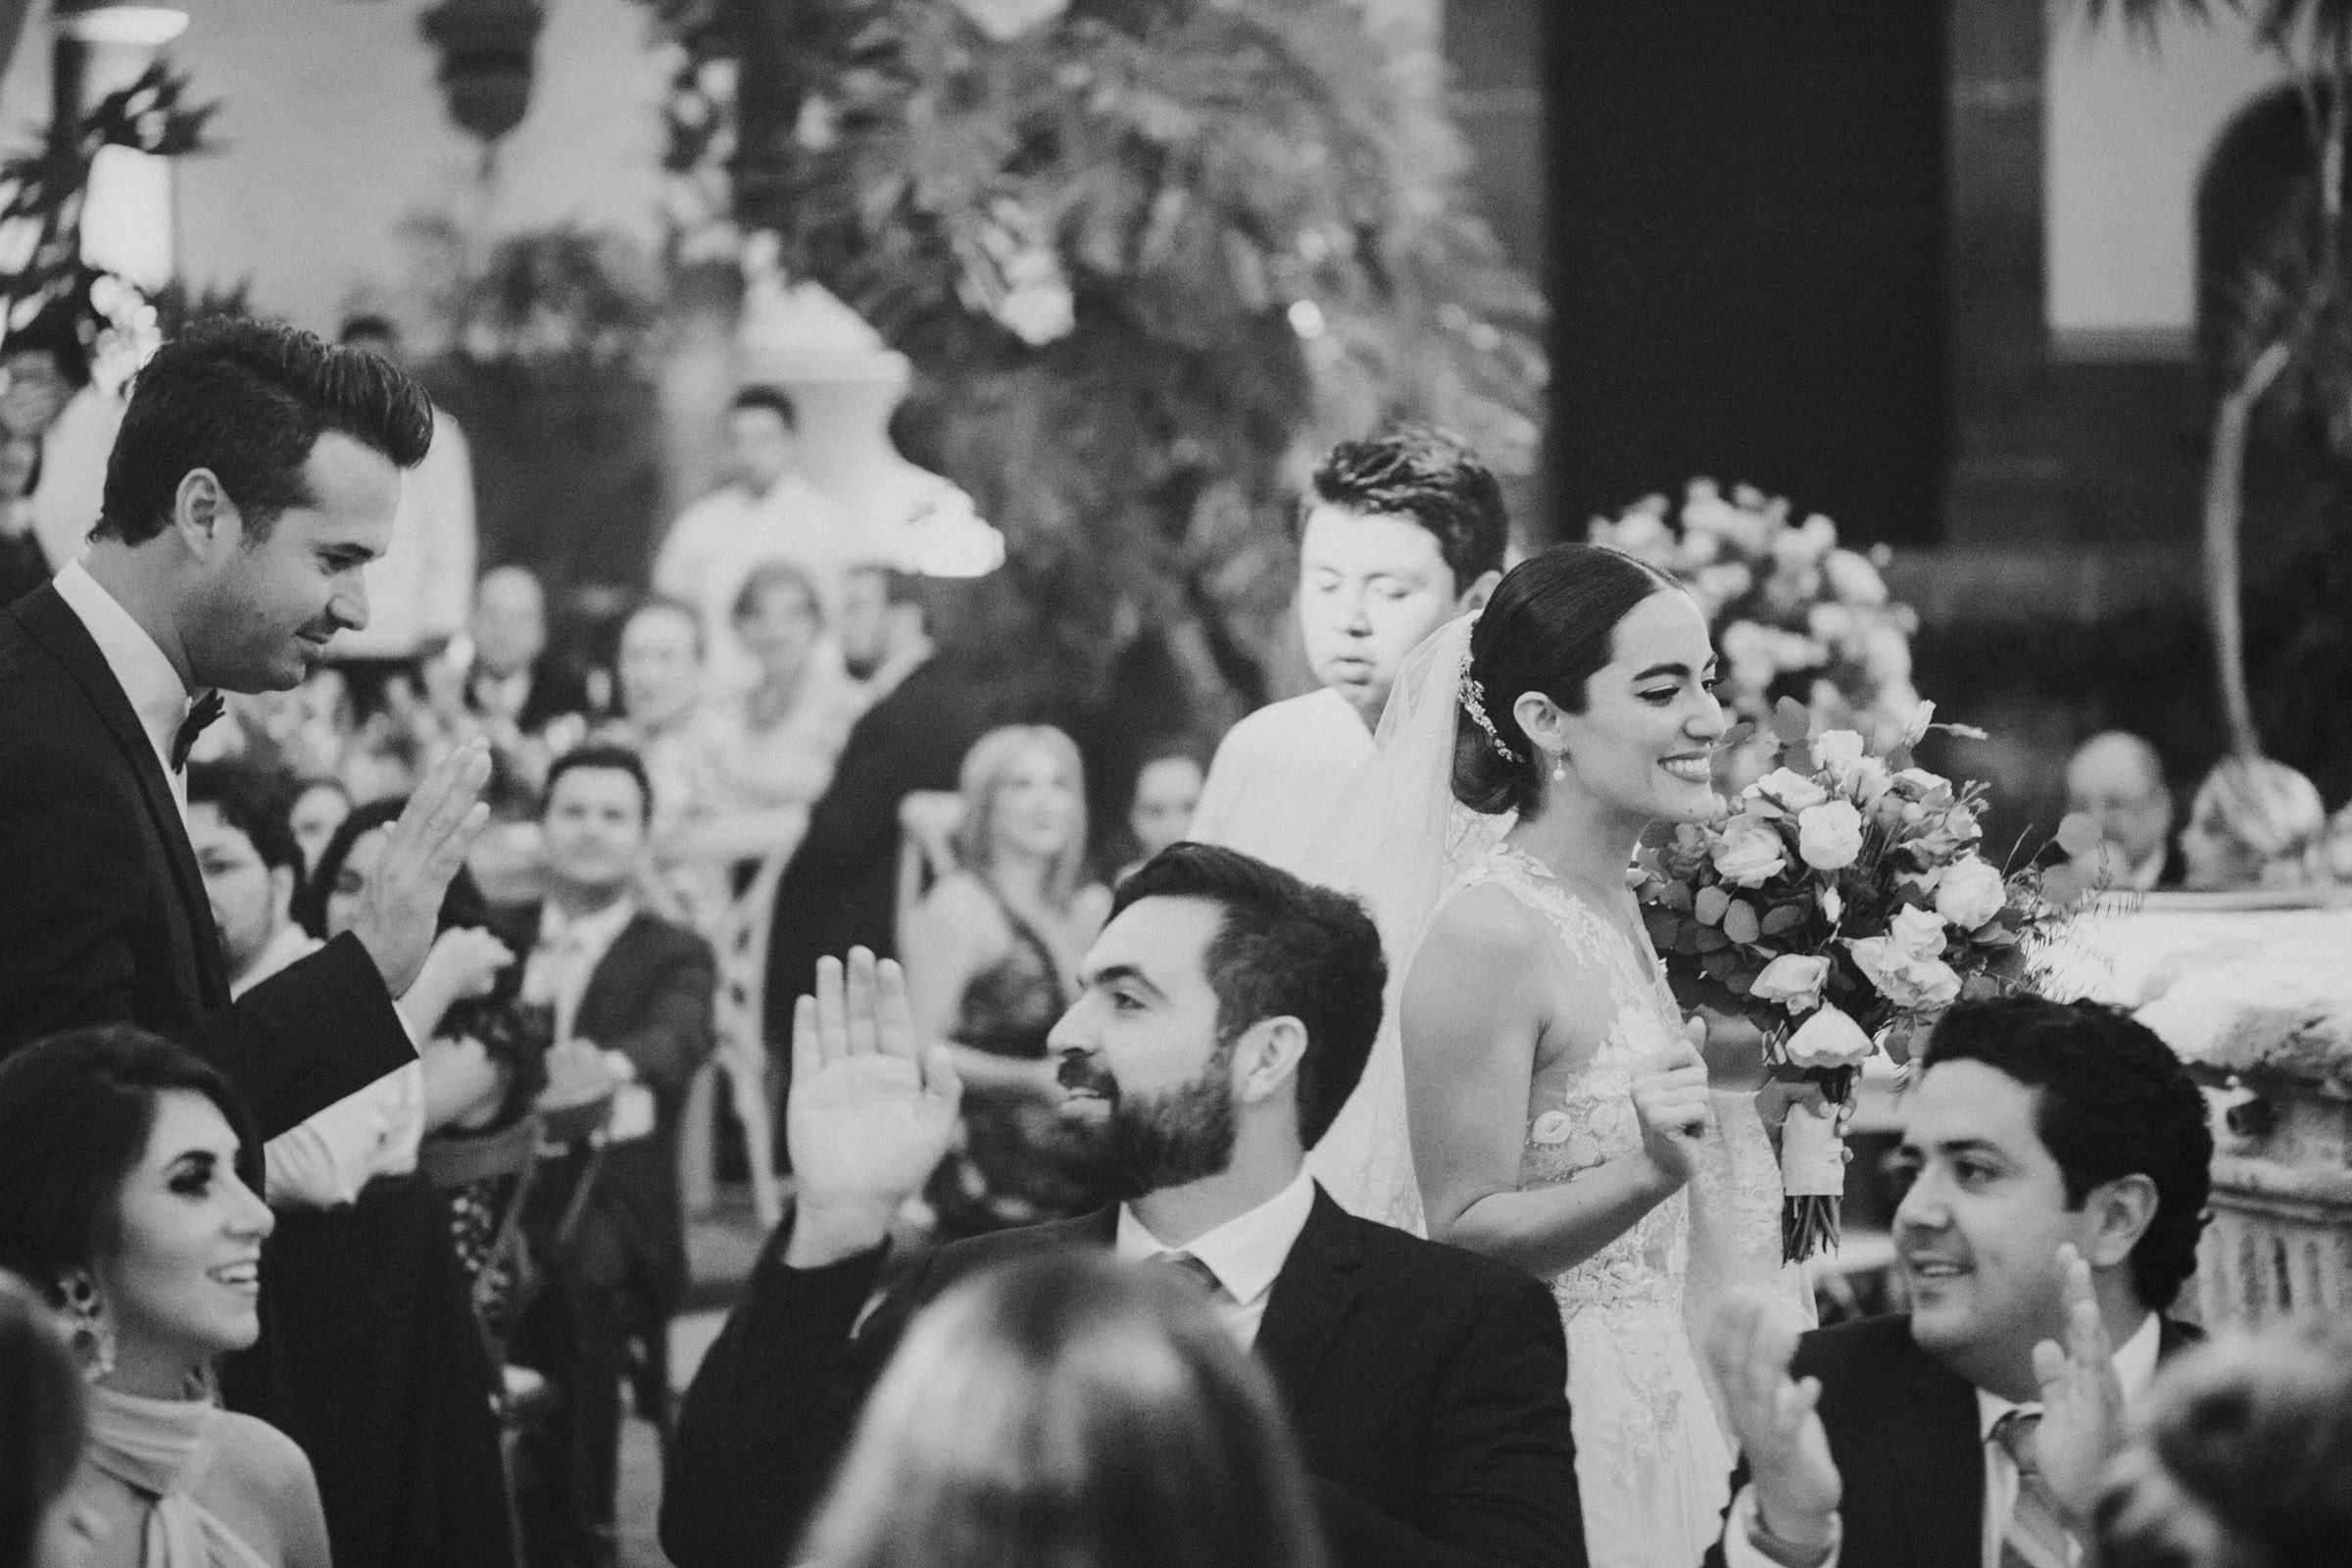 San-Miguel-de-Allende-Wedding-Photography-Parroquia-Instituto-Boda-Fotografia-Fer-Sergio-Pierce-Lifestyle-Photography0010.JPG